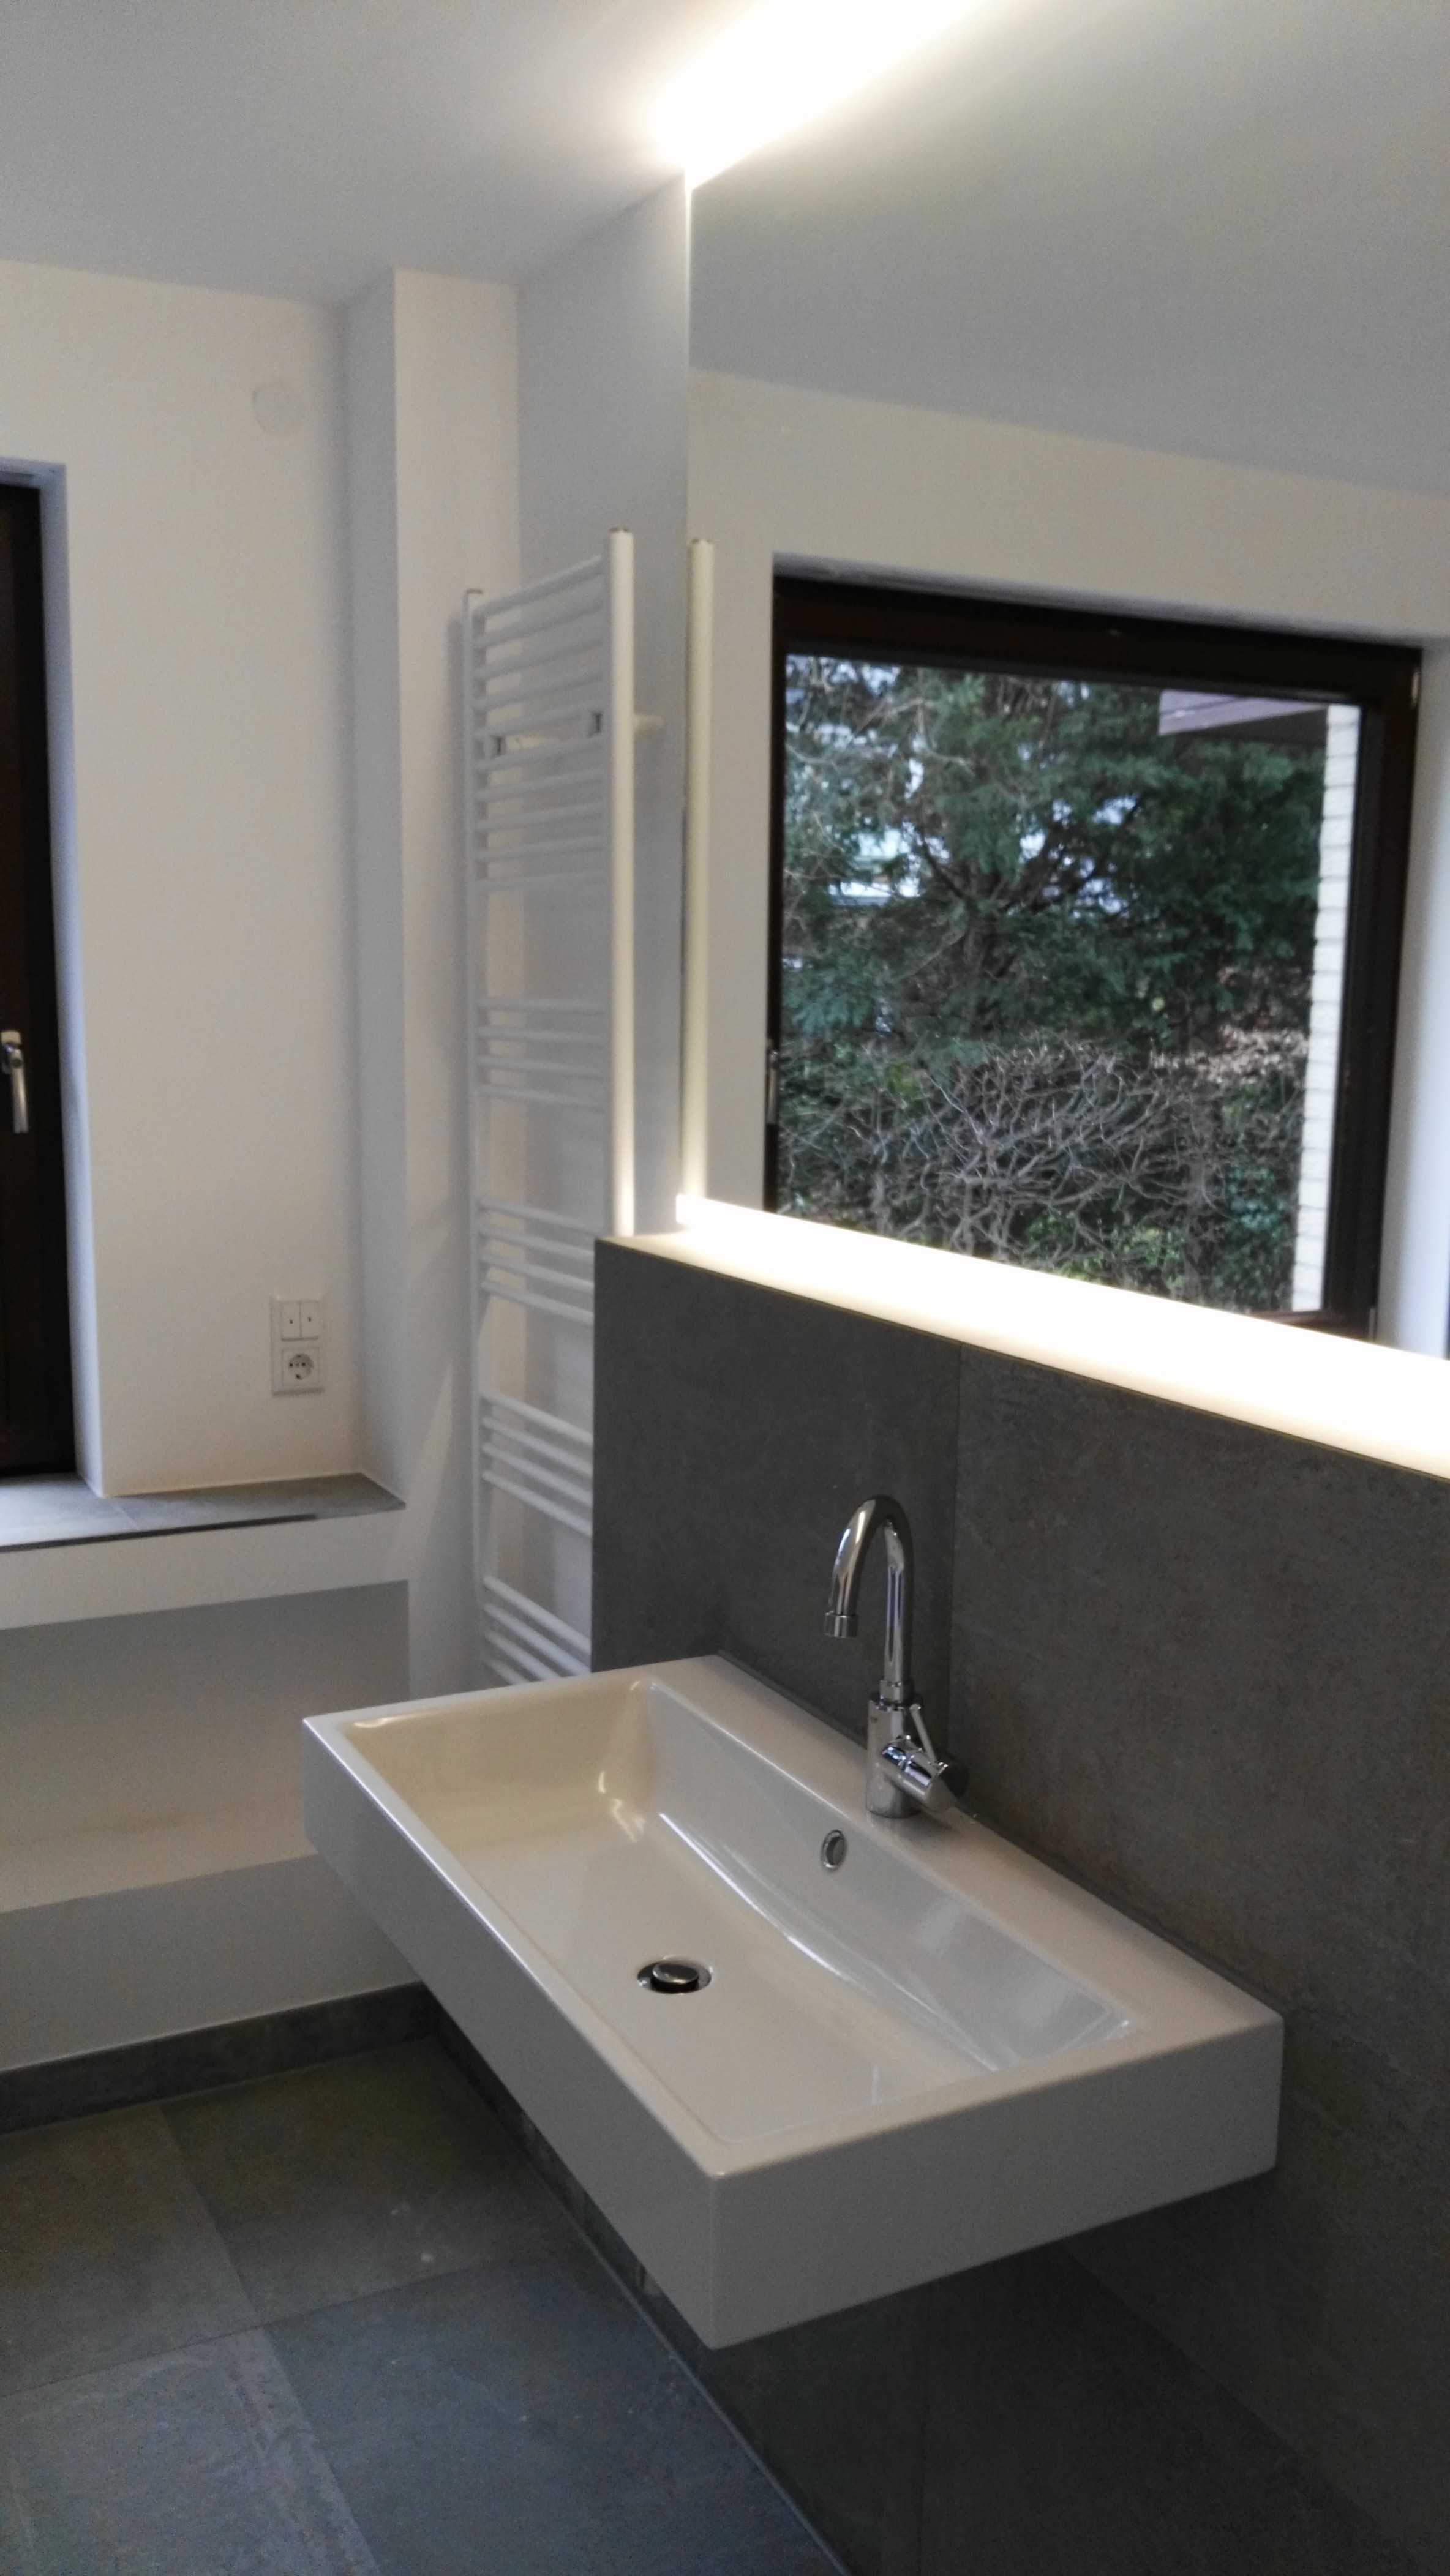 umbau: badezimmer aus den 80igern | frank wegner